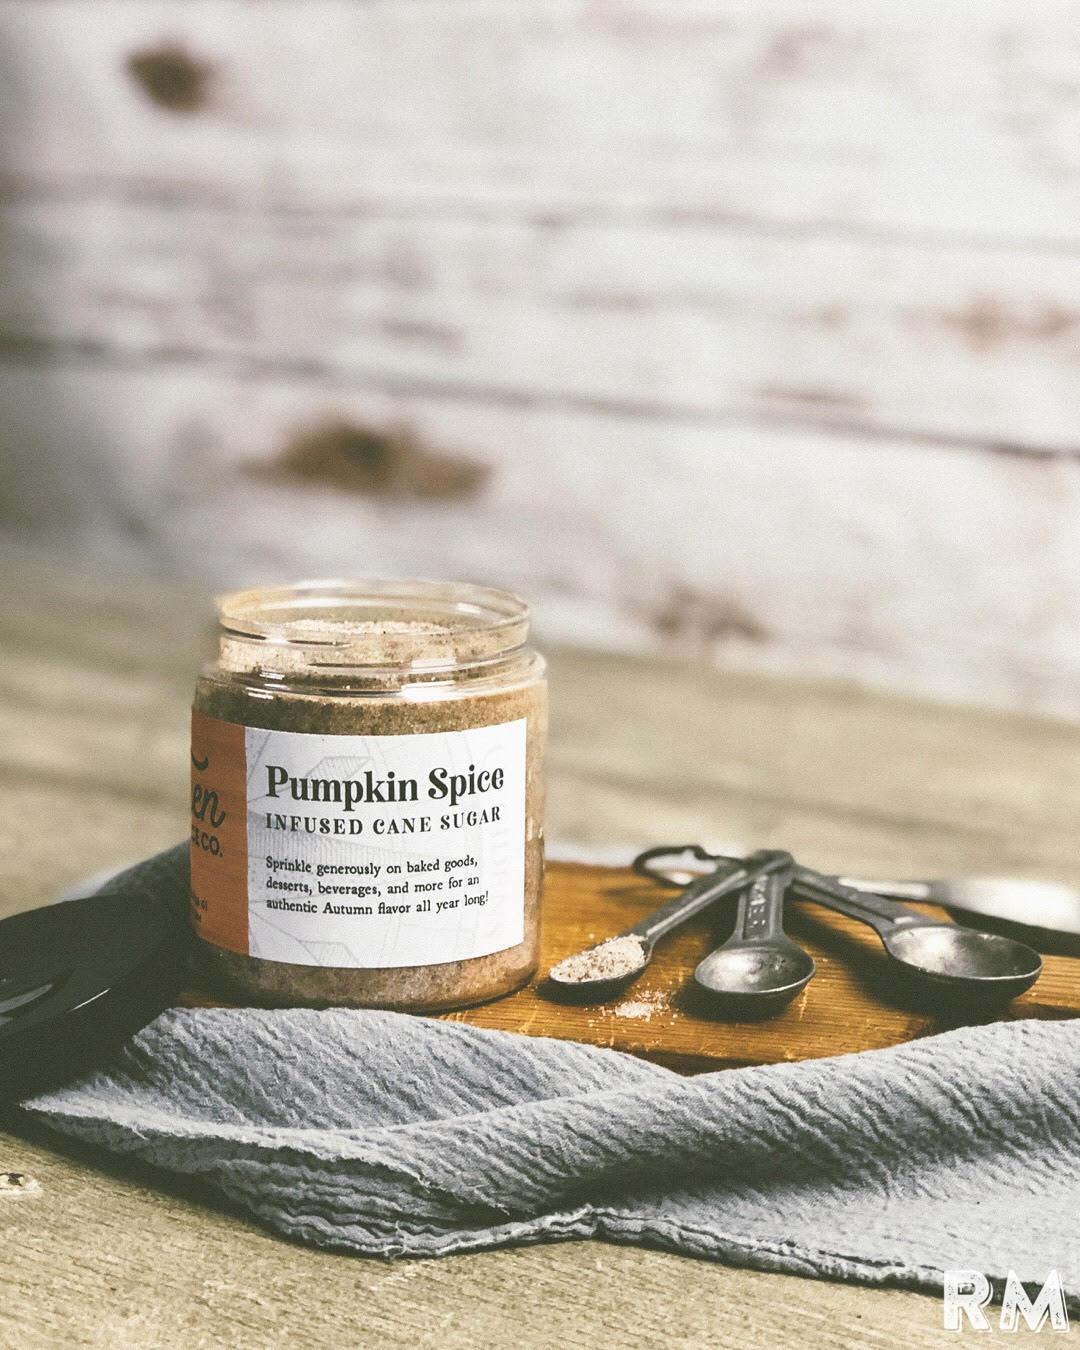 pumpkin spice infused cane sugar